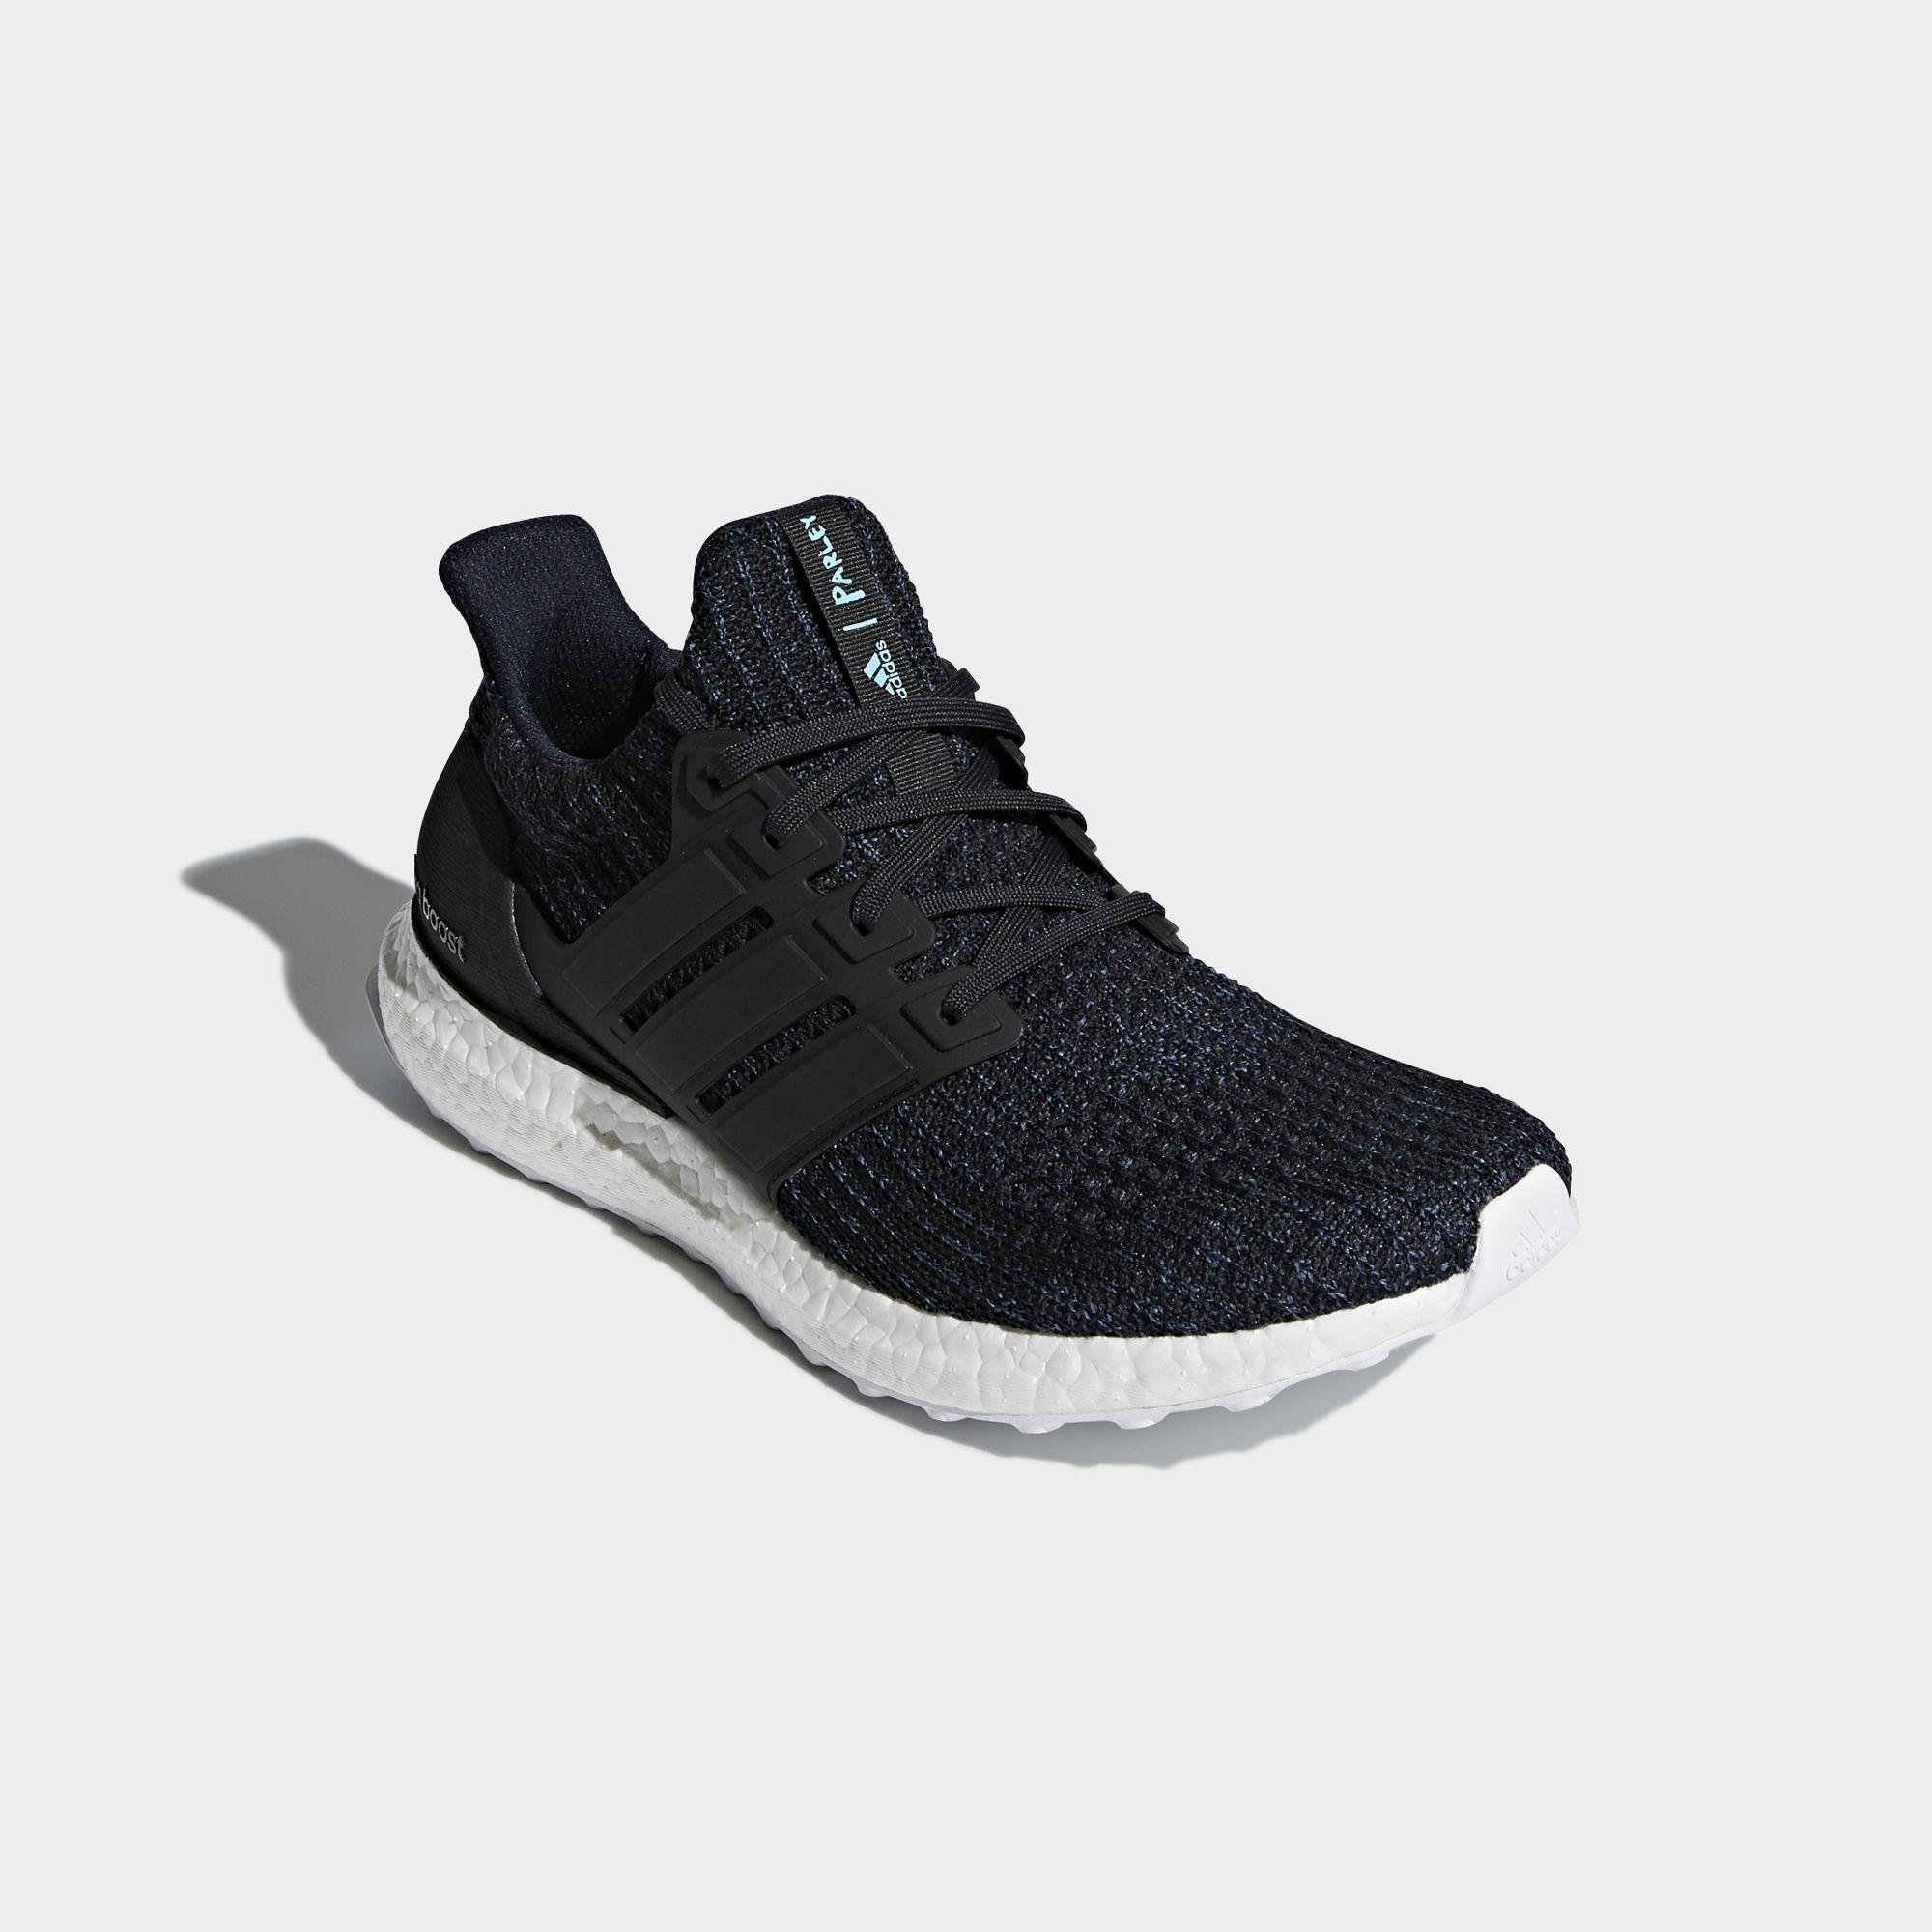 Adidas Ultraboost Legend Ink / Carbon / Blue Spirit (AC7836)